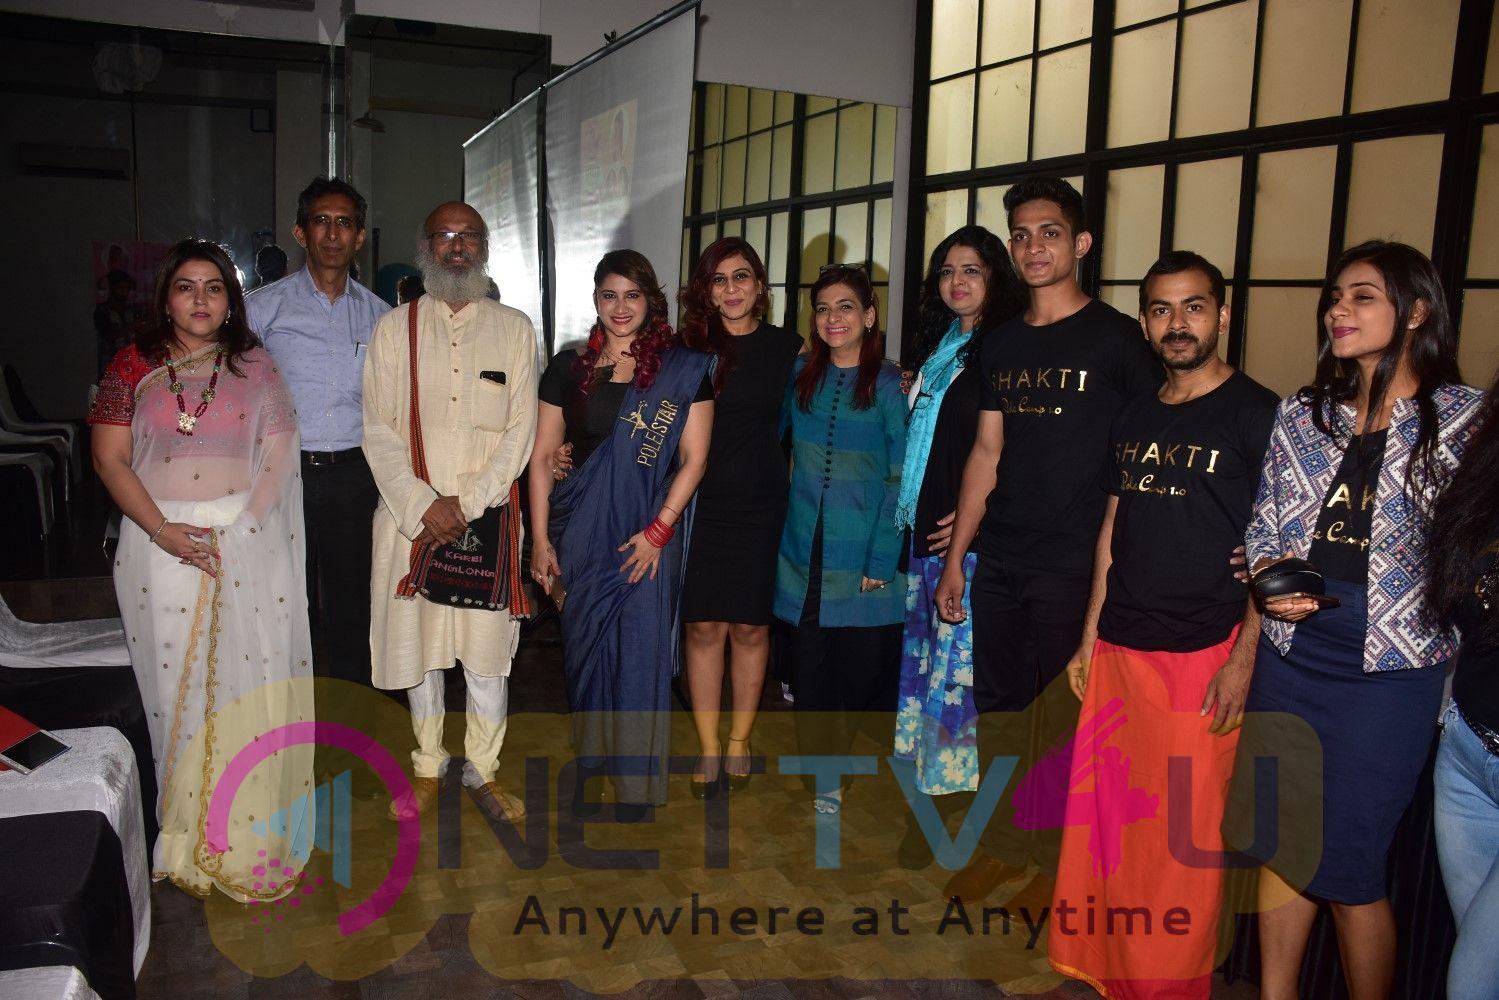 Smilie Suri Announces 4 Day Long 'SHAKTI Pole Camp V1.0' Pics Hindi Gallery